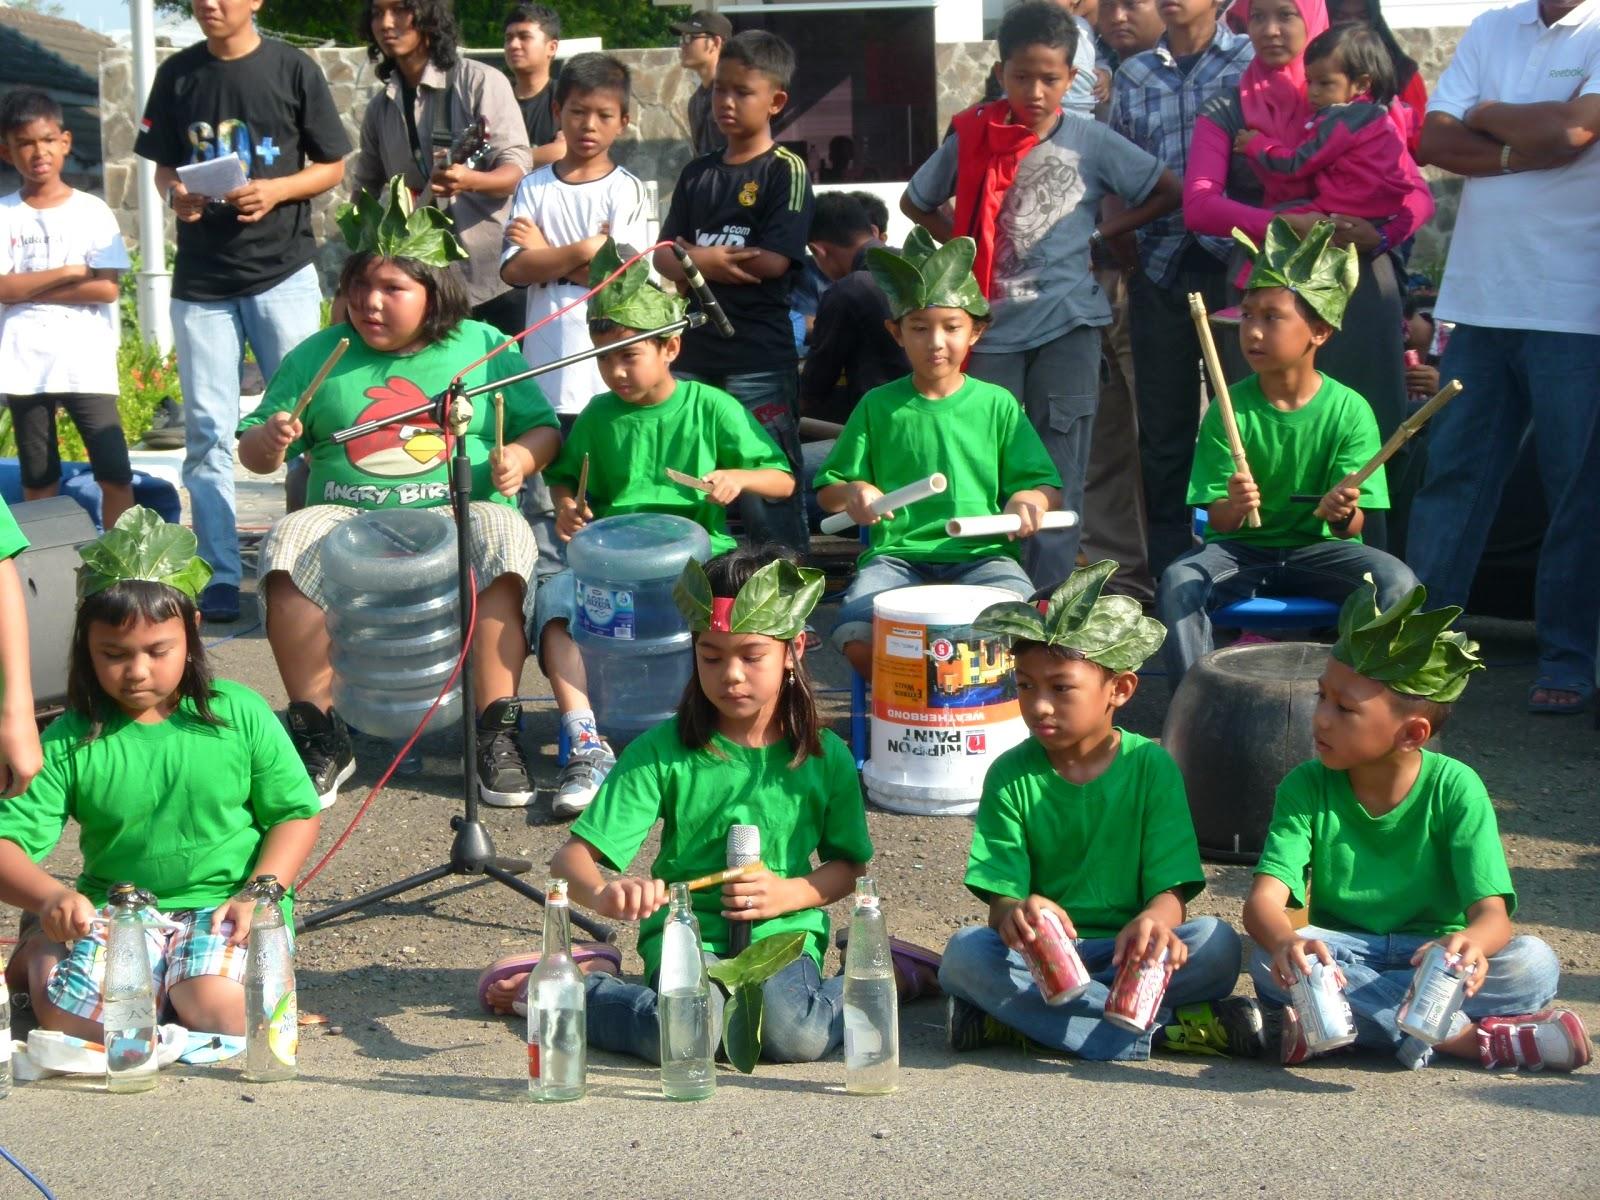 anak-anak homeschooling memainkan alat musik dari barang bekas. Foto Dendy d4b3ec63a5